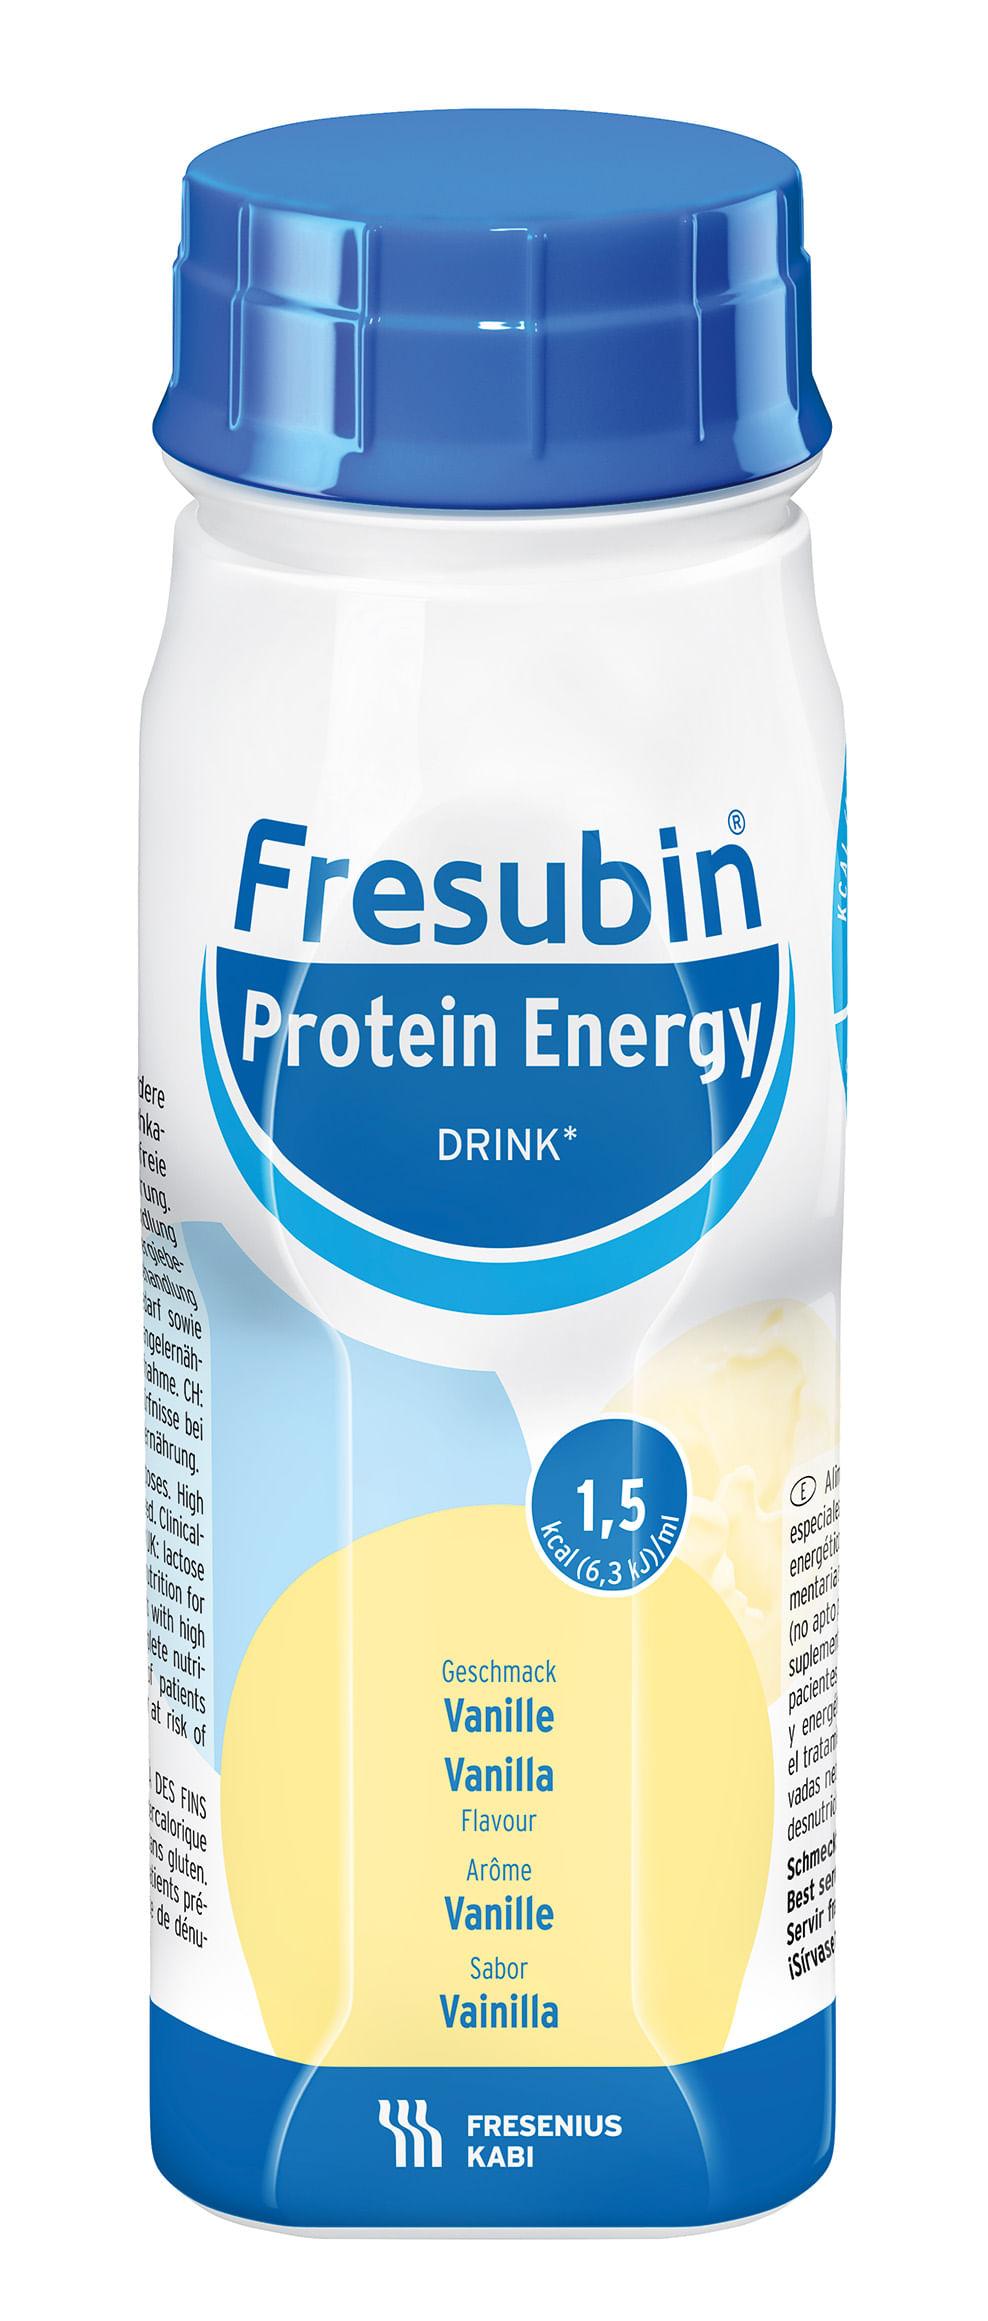 Fresubin_Protein_Energy_Vanilla_EBo_Frontal